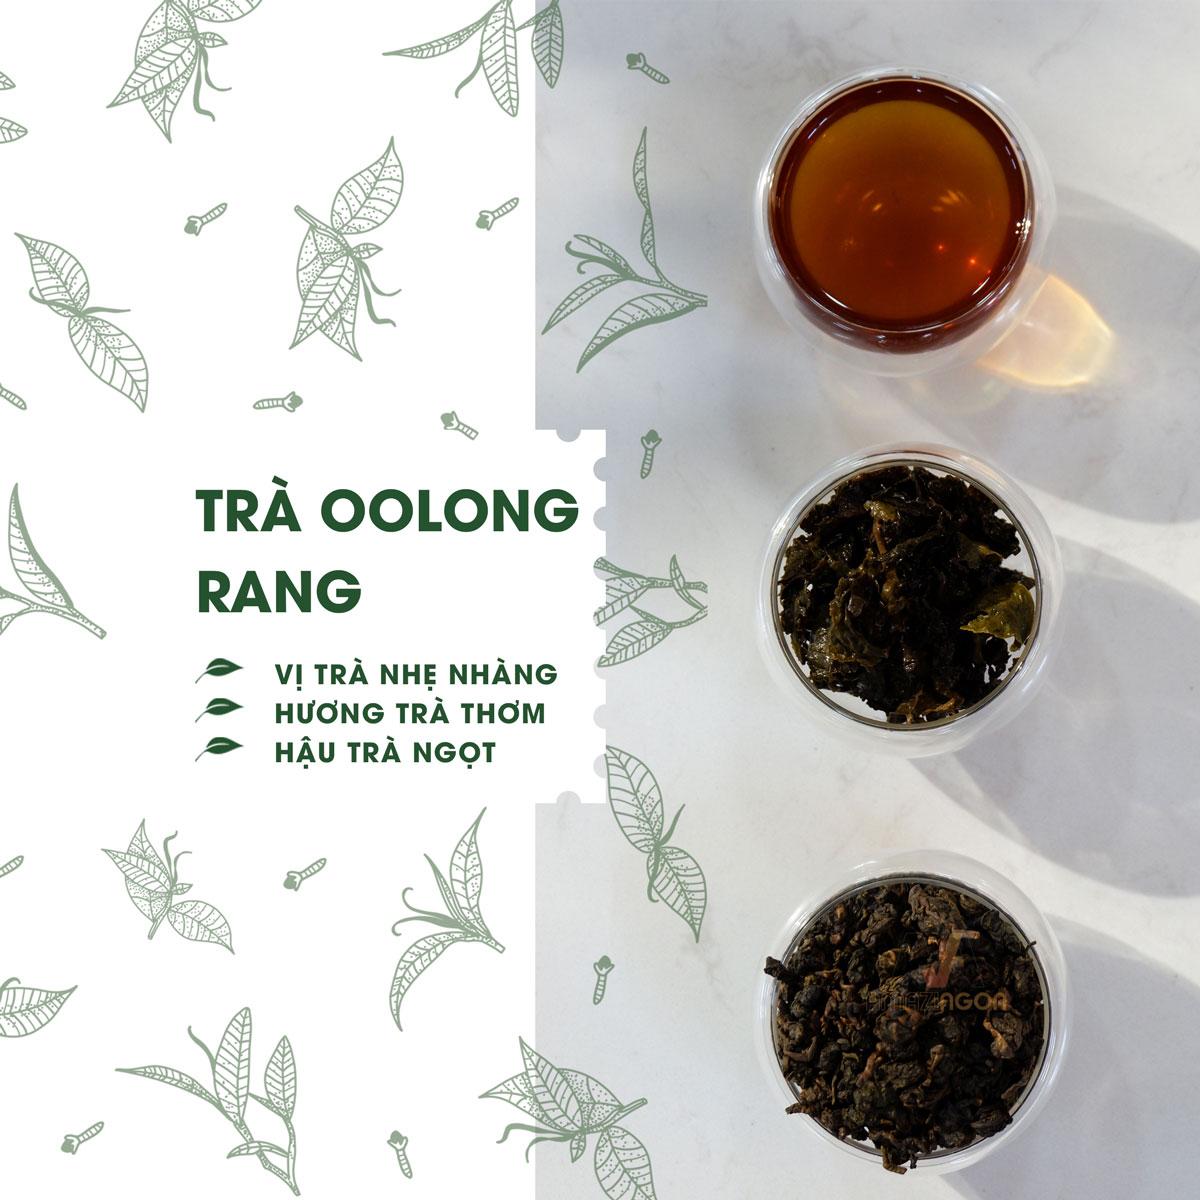 TRÀ OOLONG RANG AMAZINGON